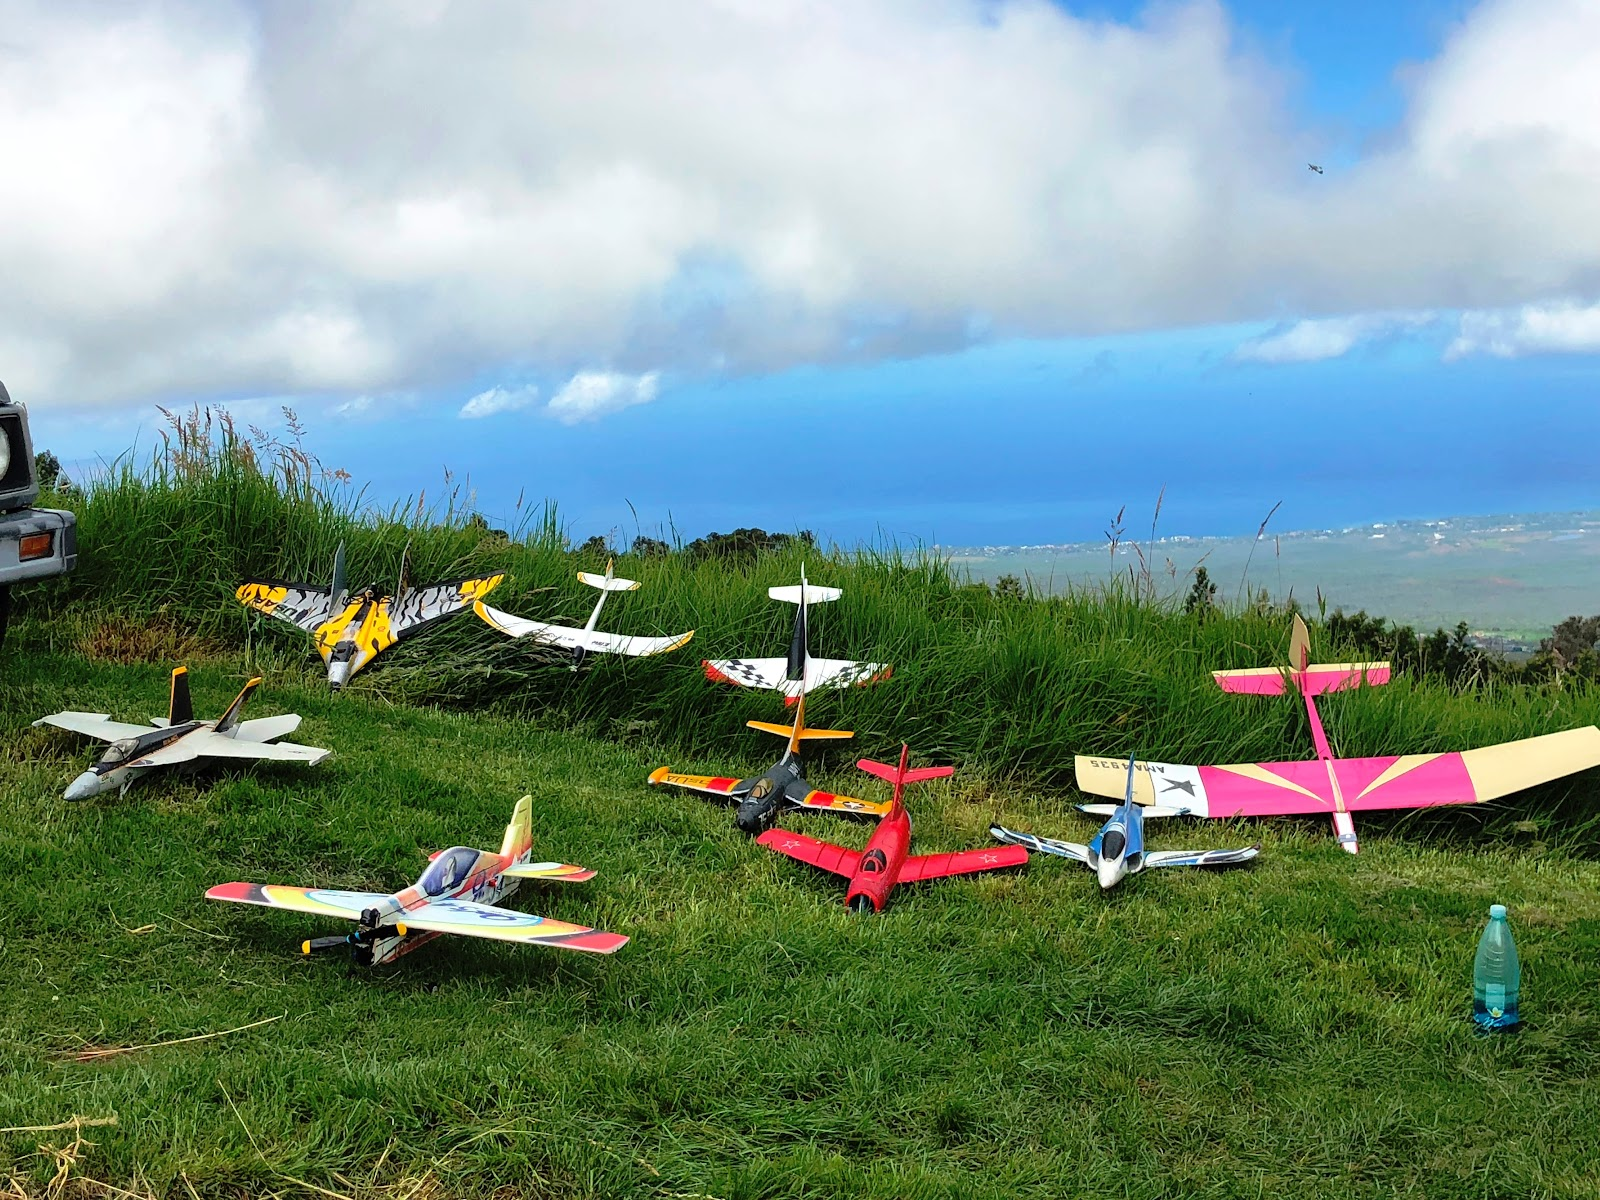 Model Airplanes at Waipoli parasailing and model airplane location on Waipoli Road.